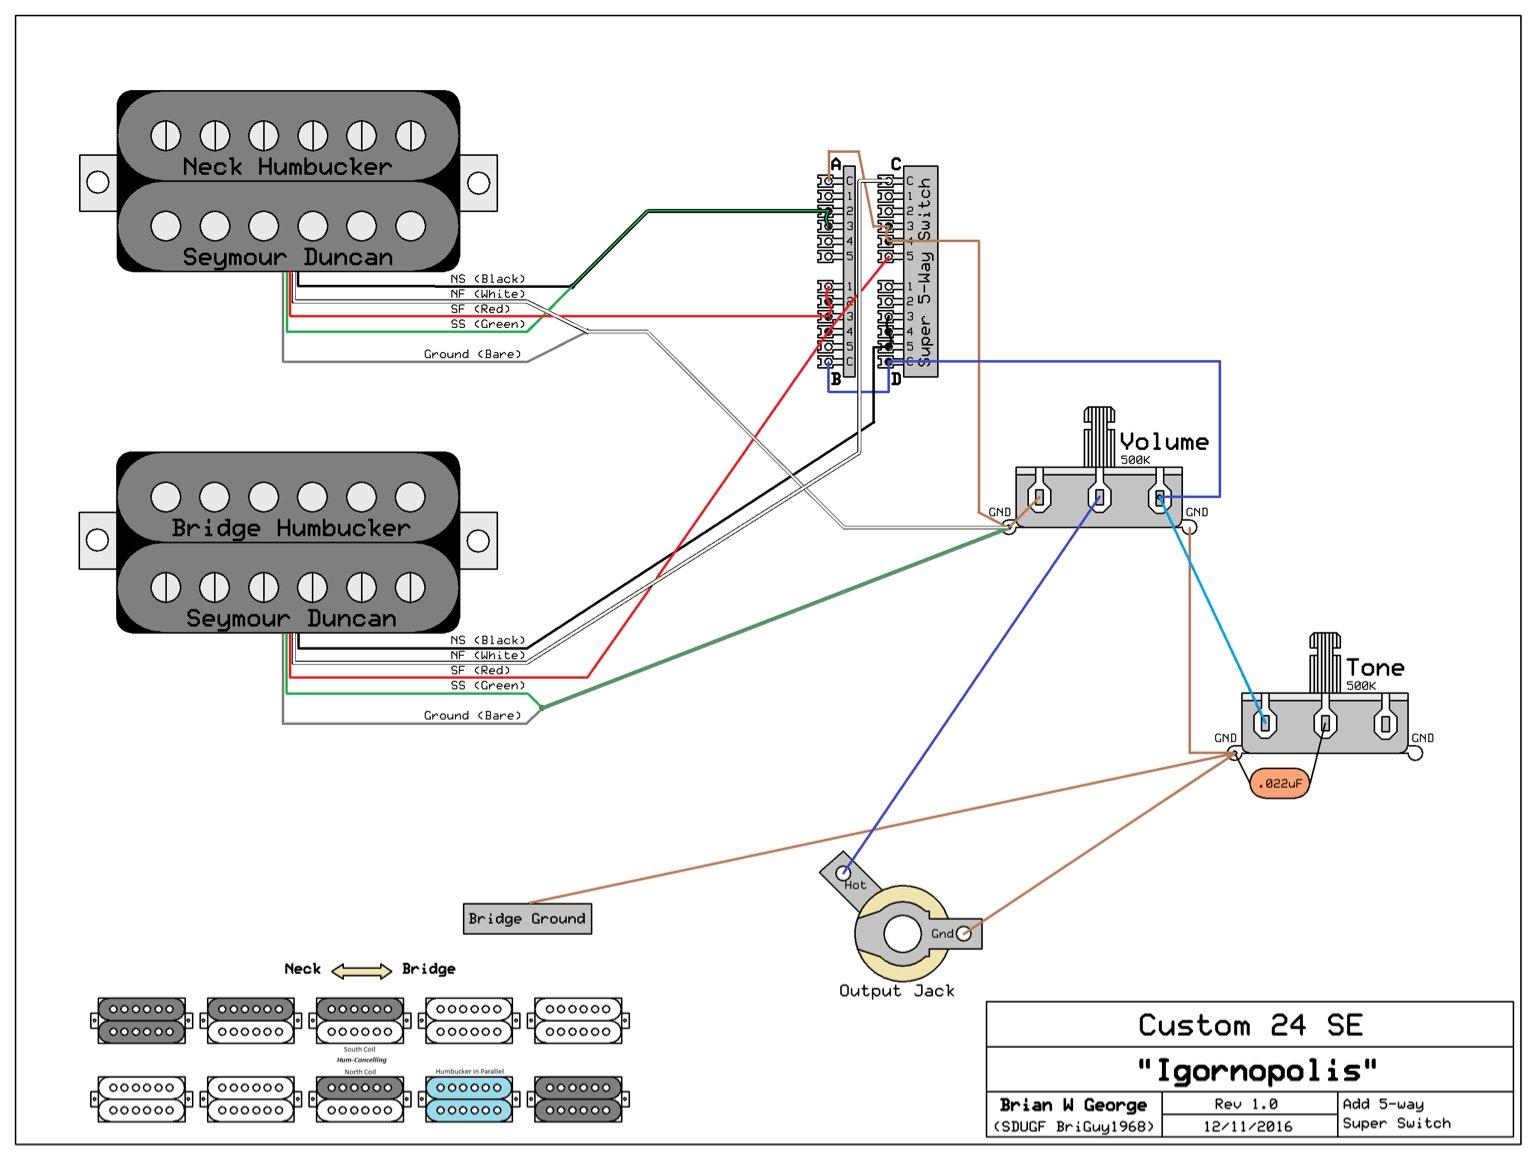 OW_0683] 5 Way Super Switch Wiring Diagram Download DiagramGious Alma Bemua Tixat Trons Mohammedshrine Librar Wiring 101